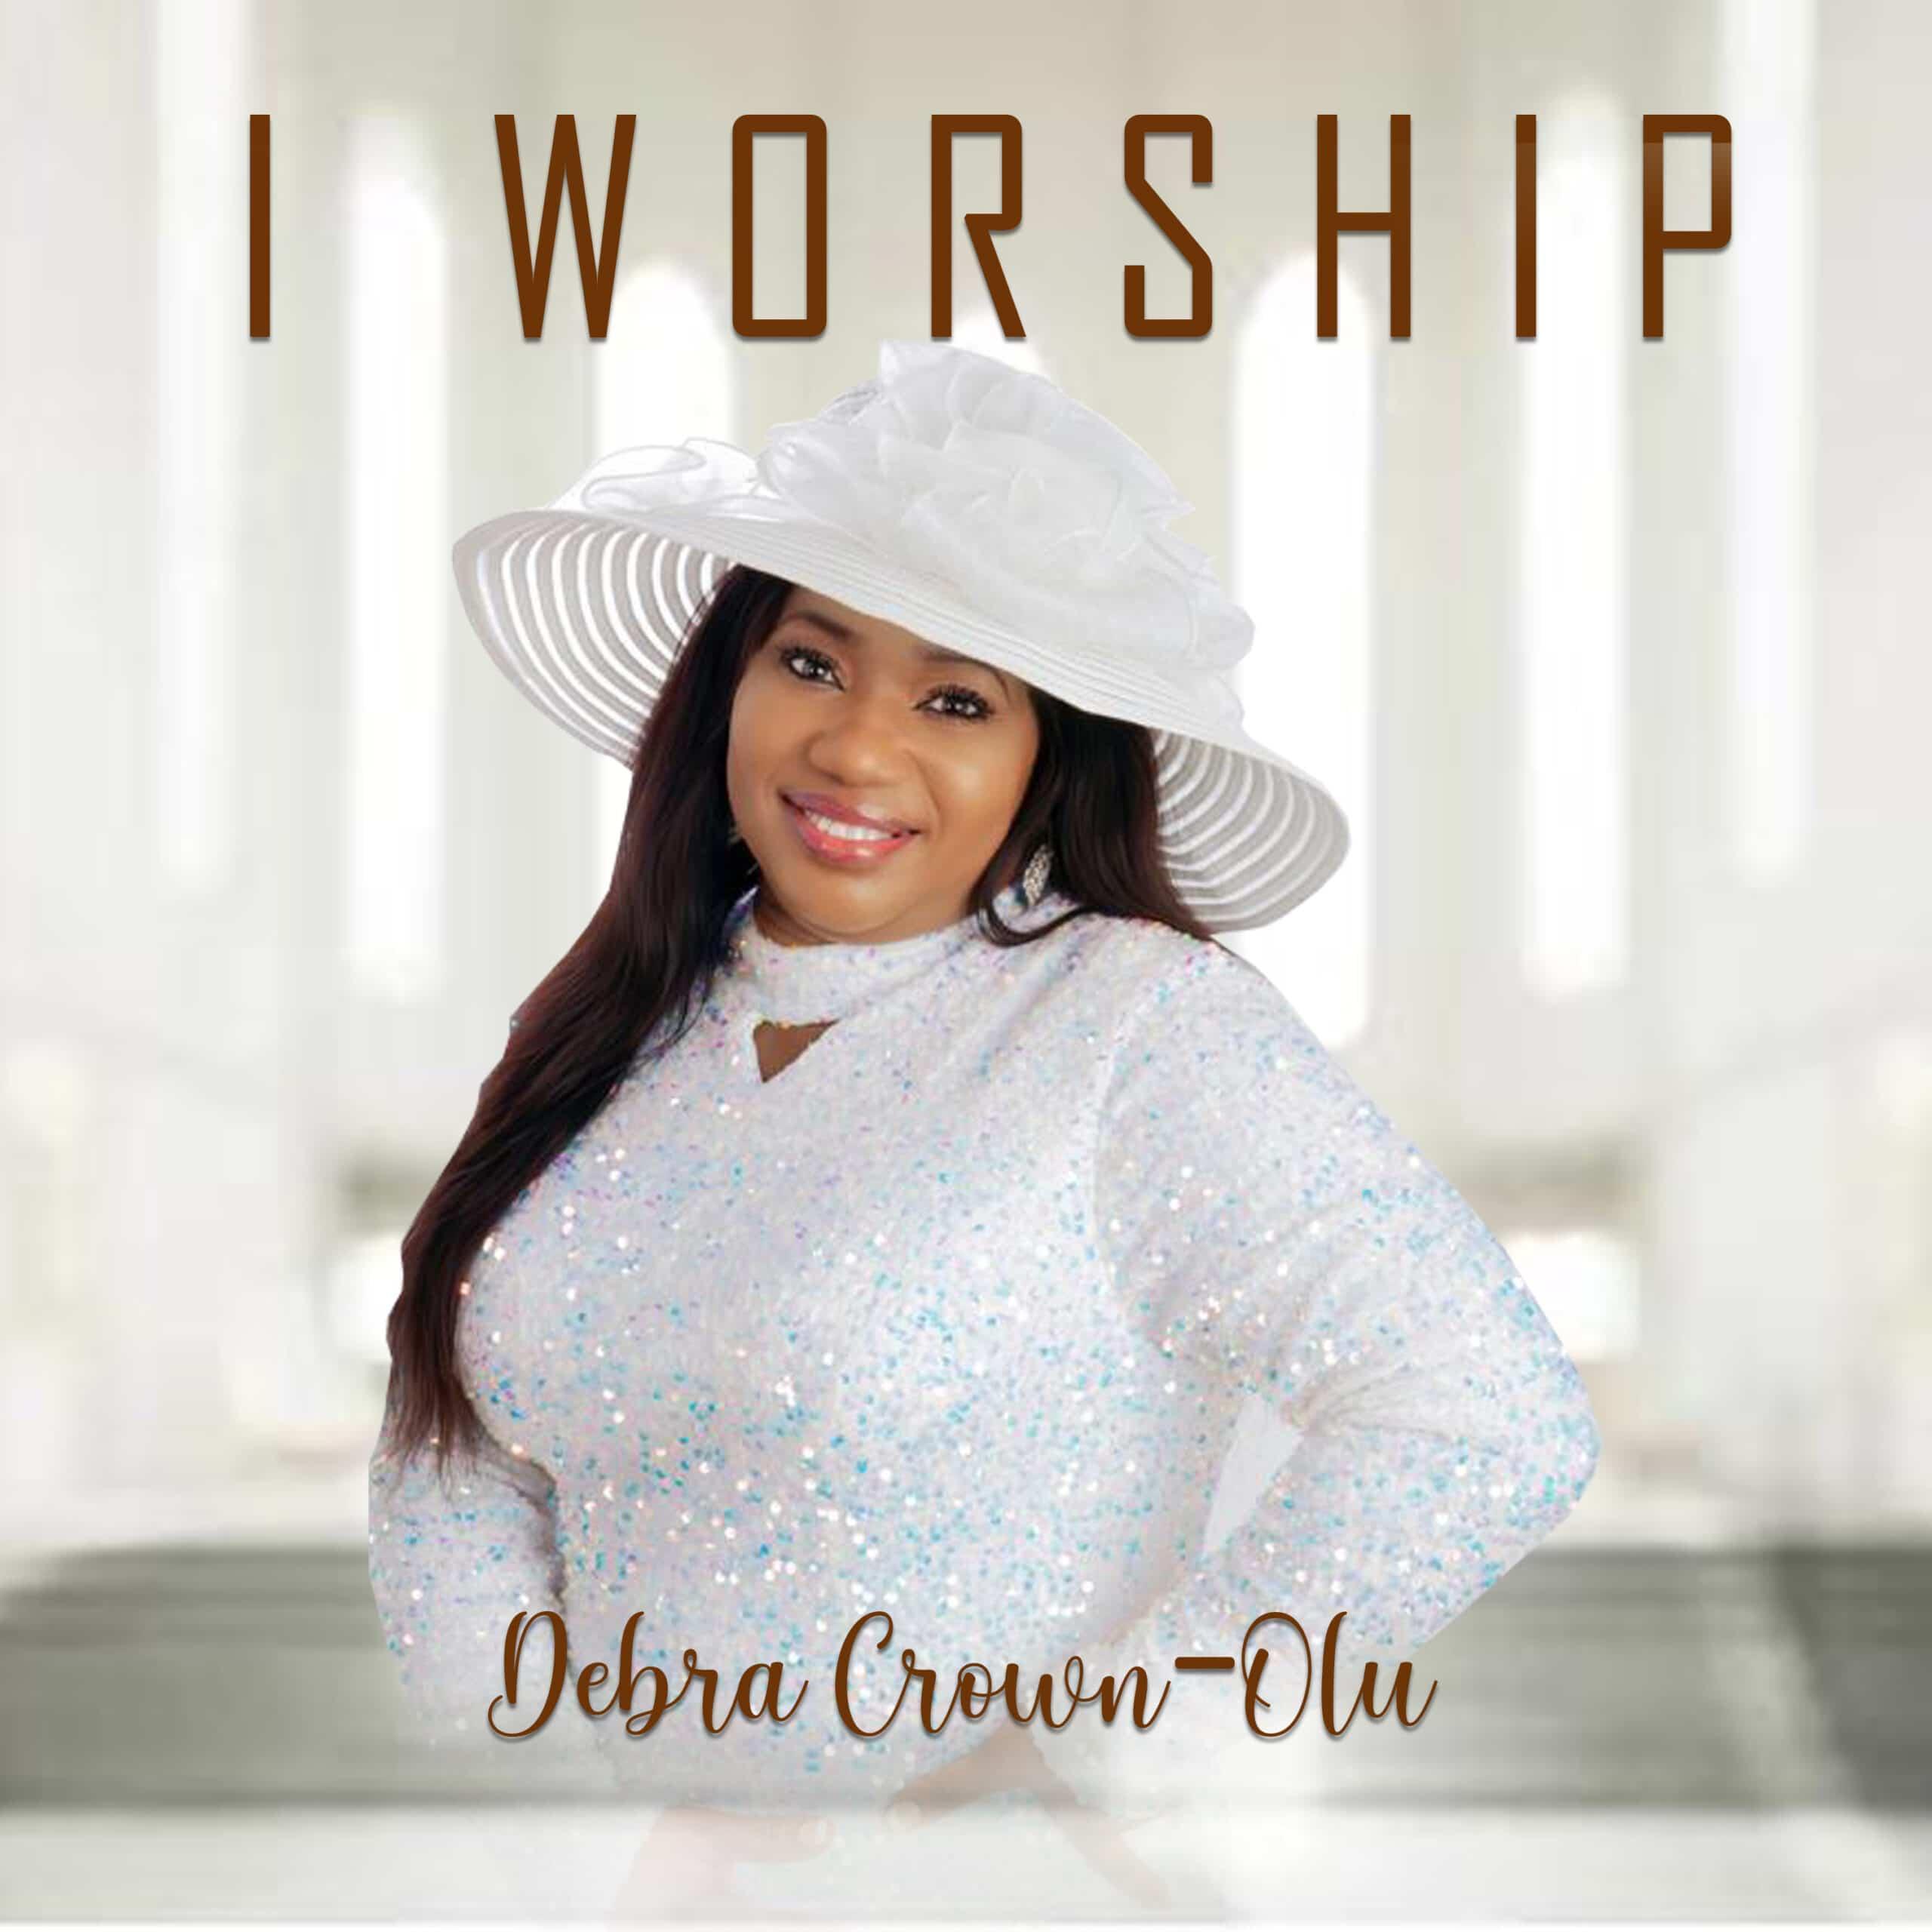 Debra Crown - I Worship